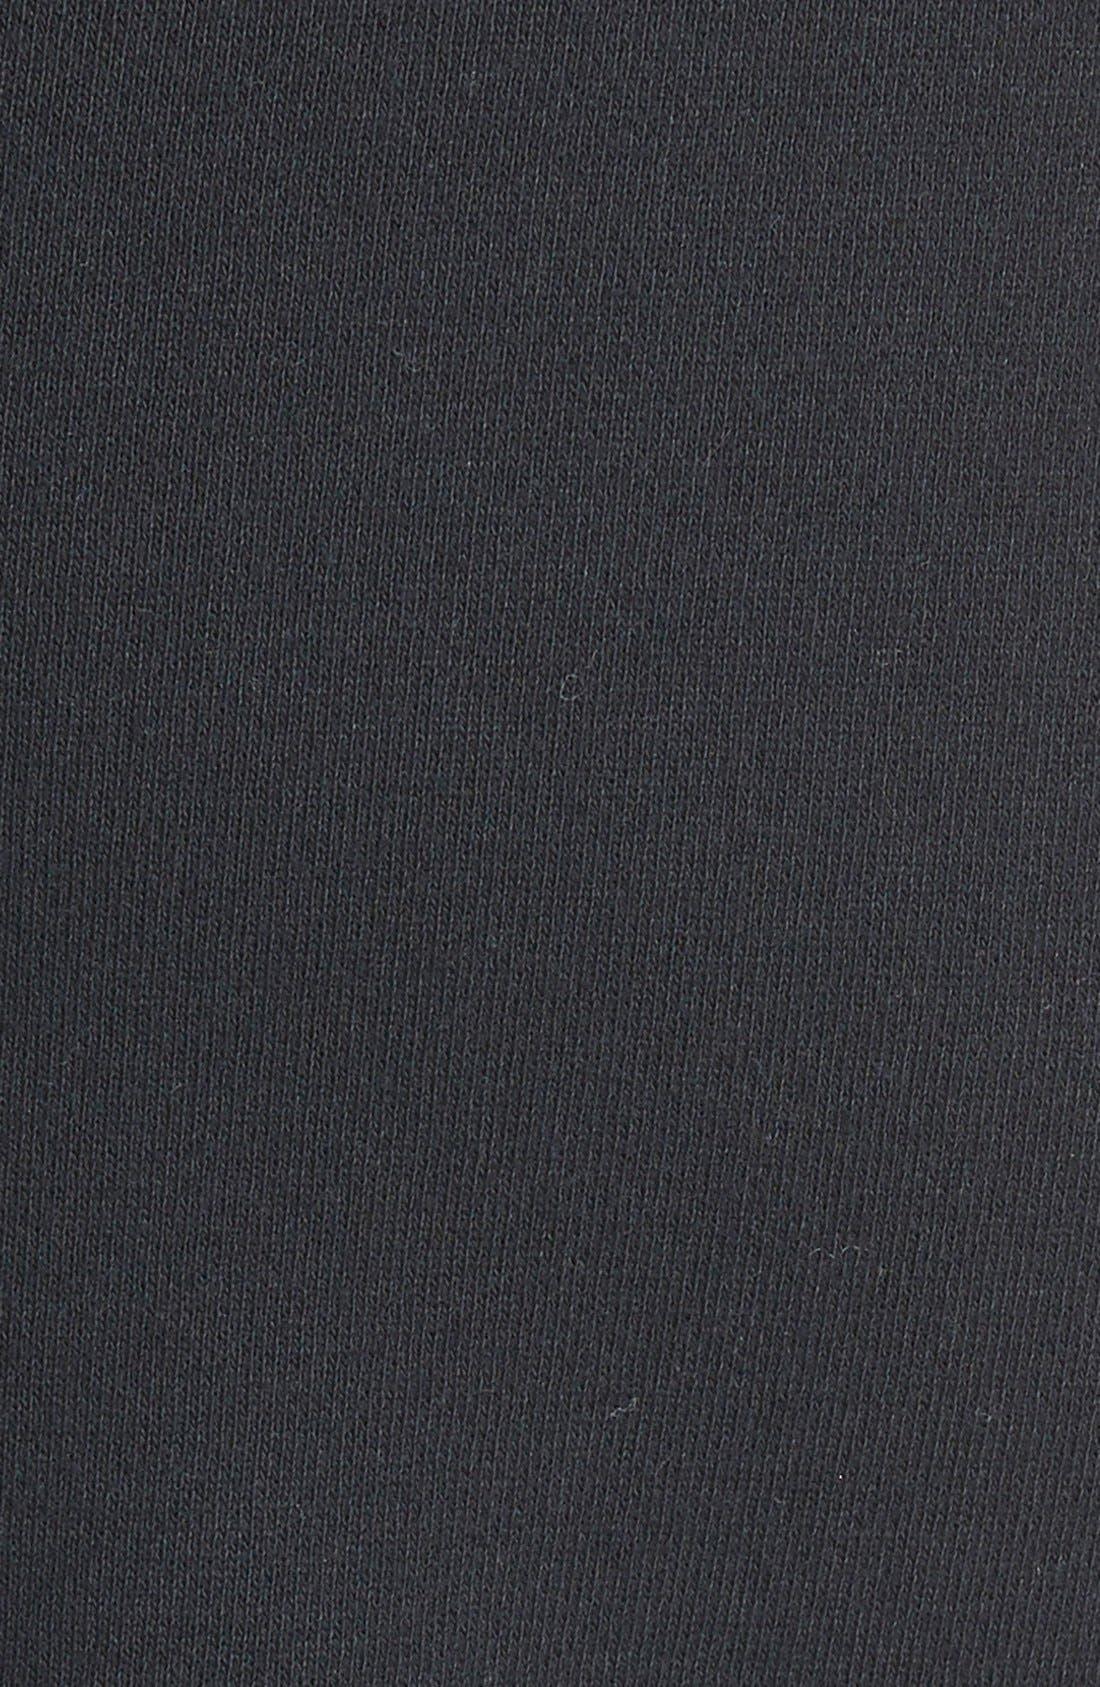 Alternate Image 3  - James Perse Fleece Pencil Skirt